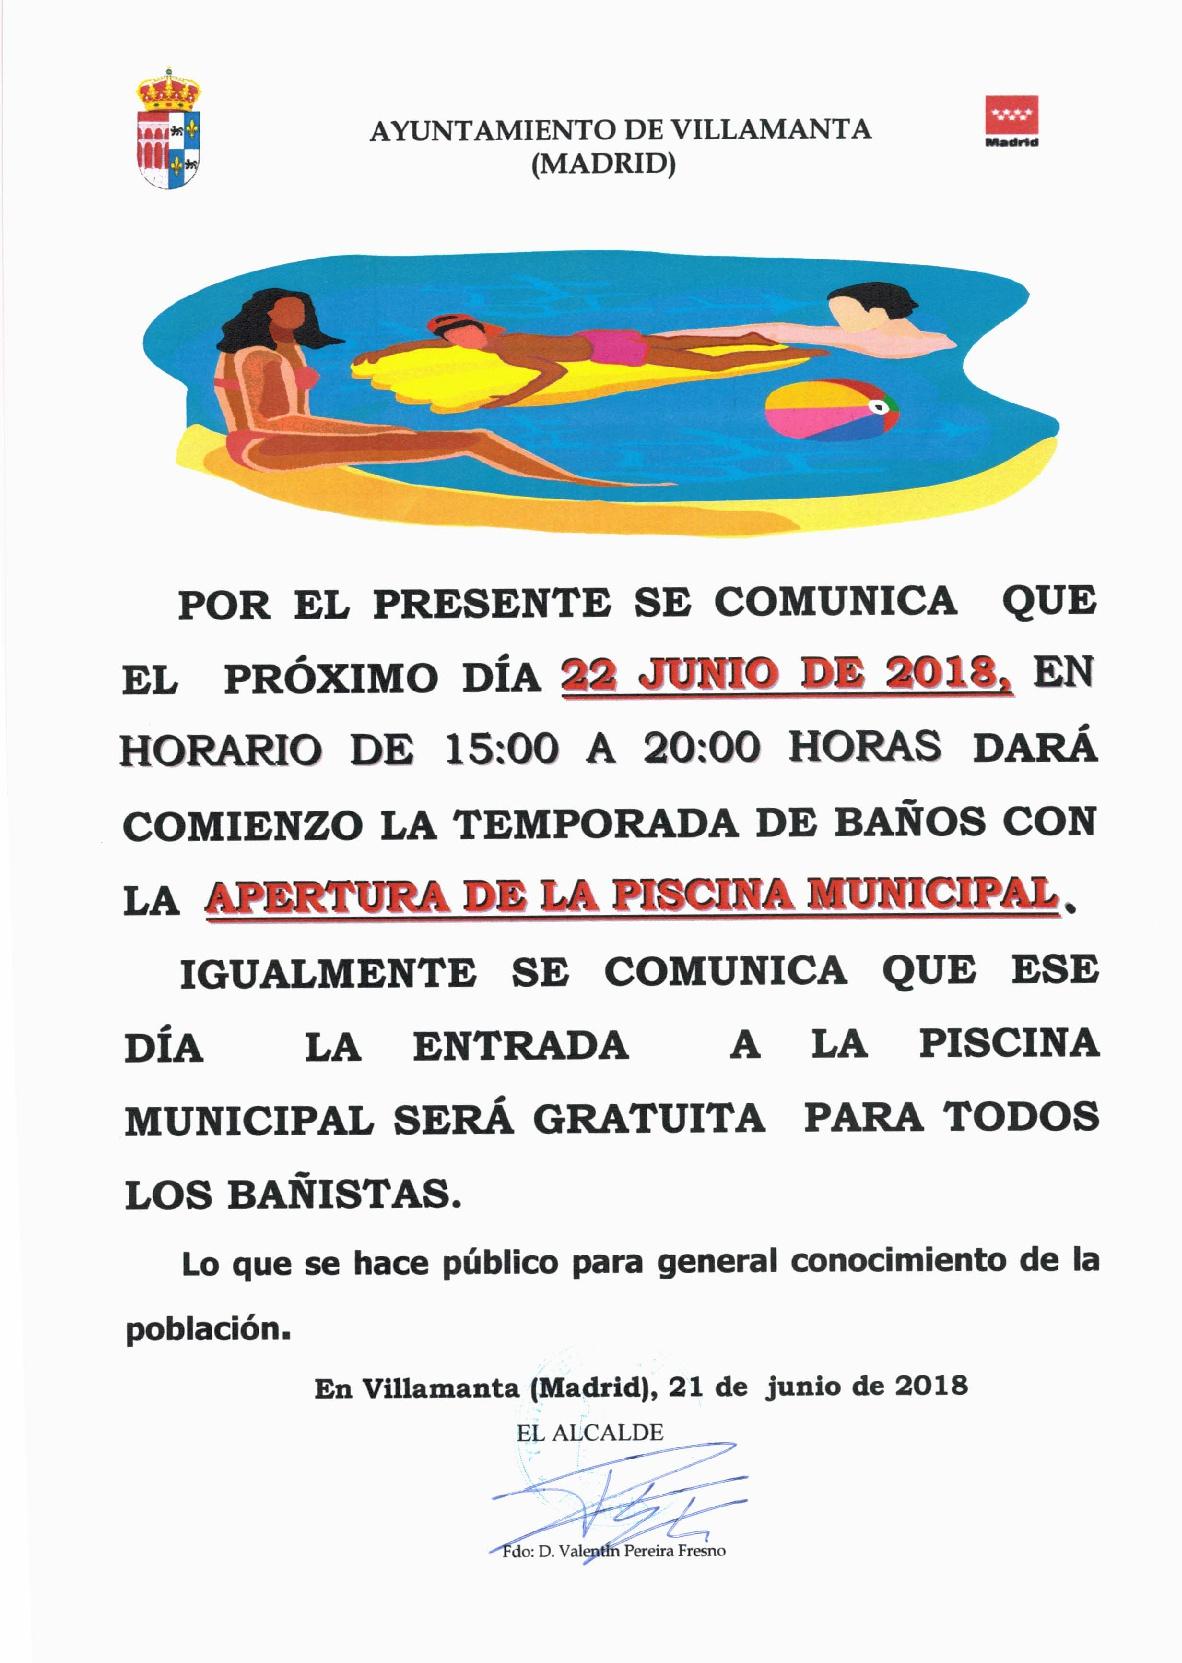 Apertura piscina 22 de junio de 2018